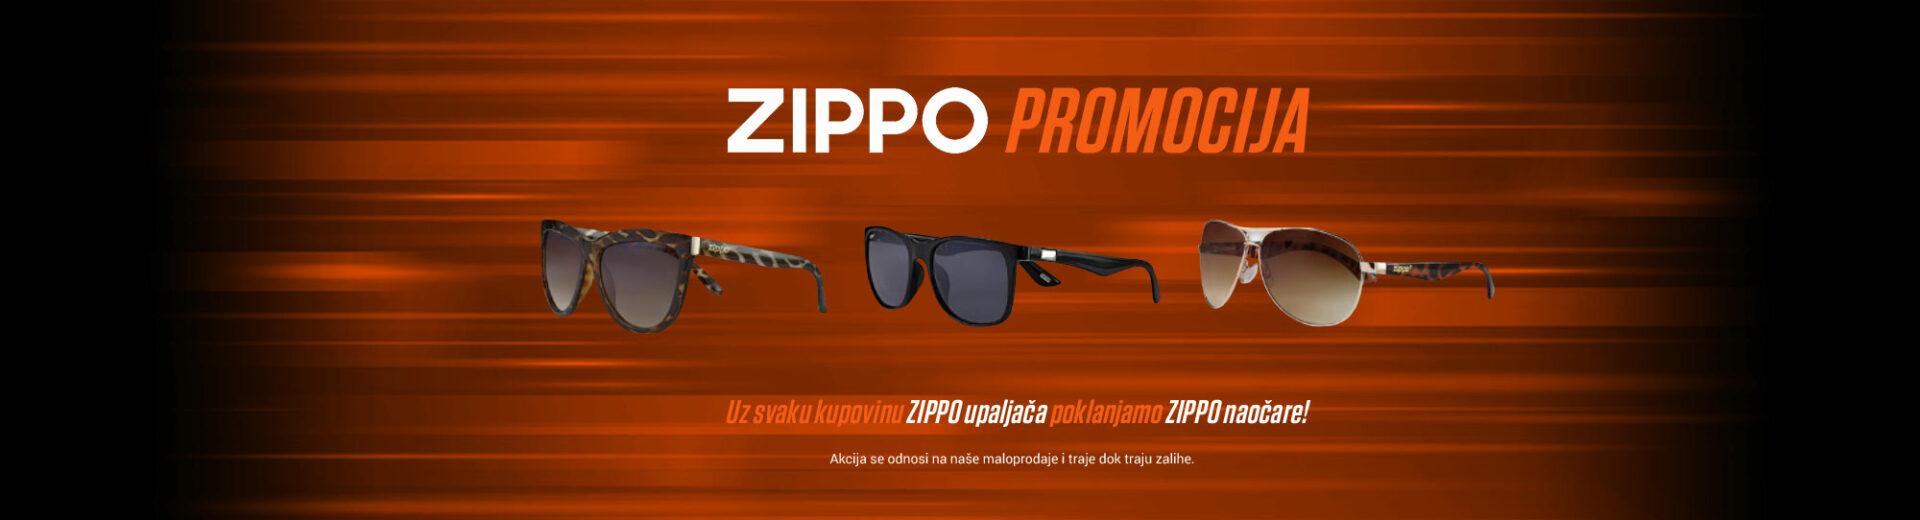 ekspedicija zippo promocija desktop 02